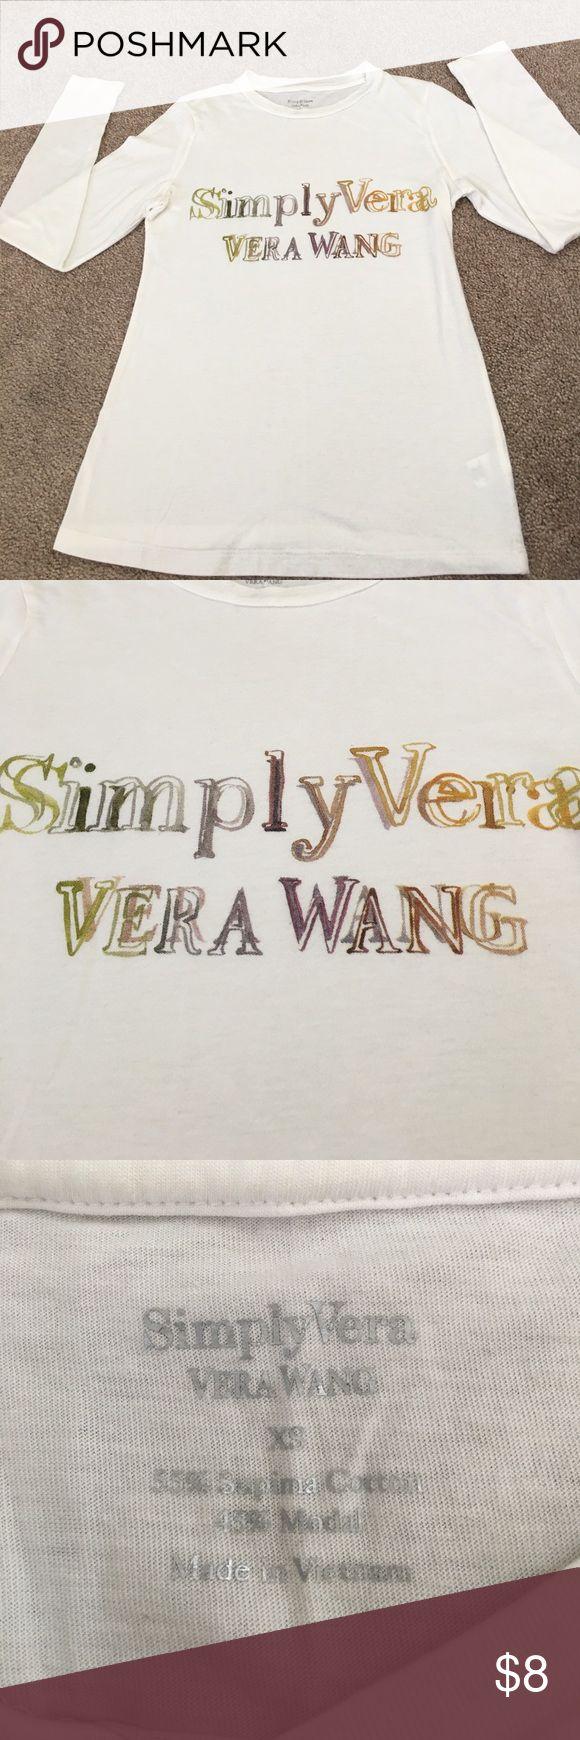 Simply Vera Wang Tee Long Sleeve Simply Vera Wang Tee; size XS; great condition, great stretch; 100% Soft Cotton; smoke & pet free environment Simply Vera Vera Wang Tops Tees - Long Sleeve